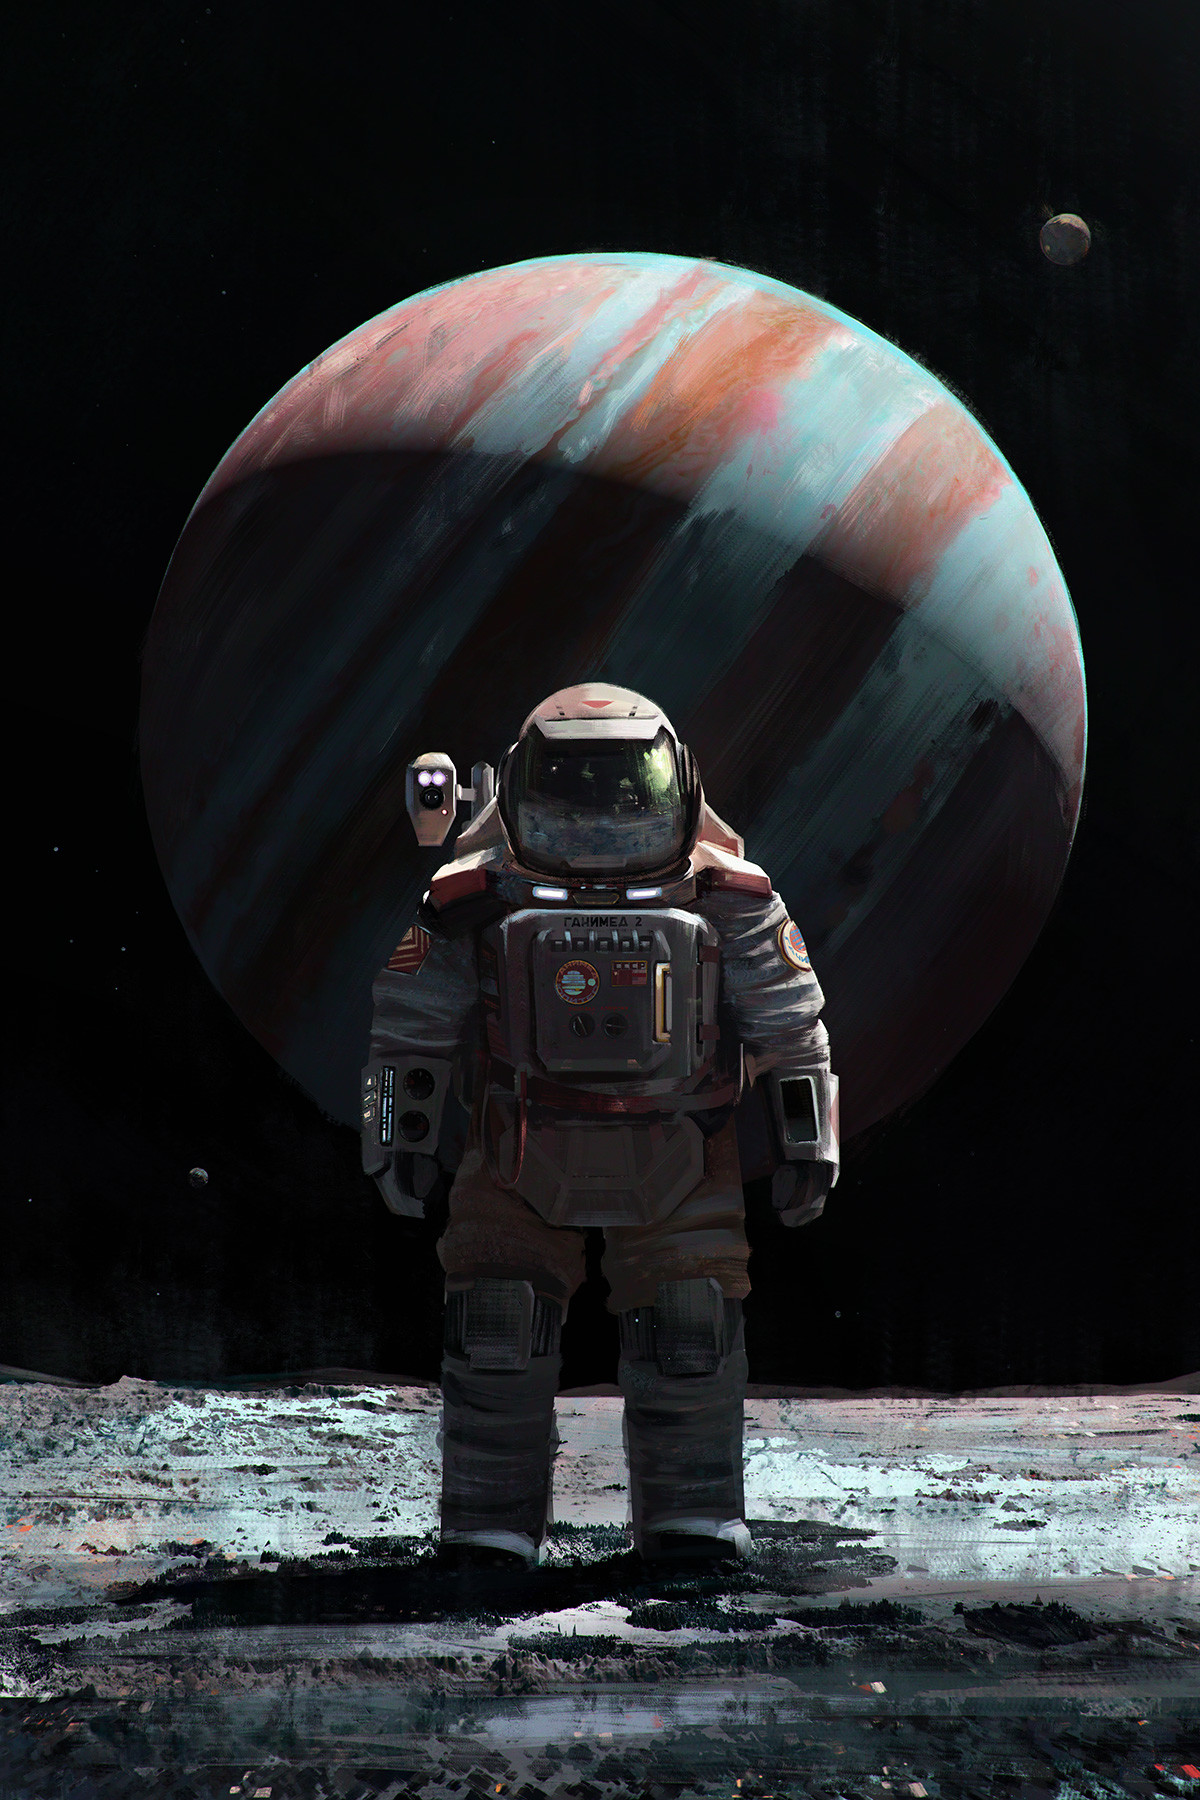 Cosmonaut on Ganymede by Mac Rebisz 1